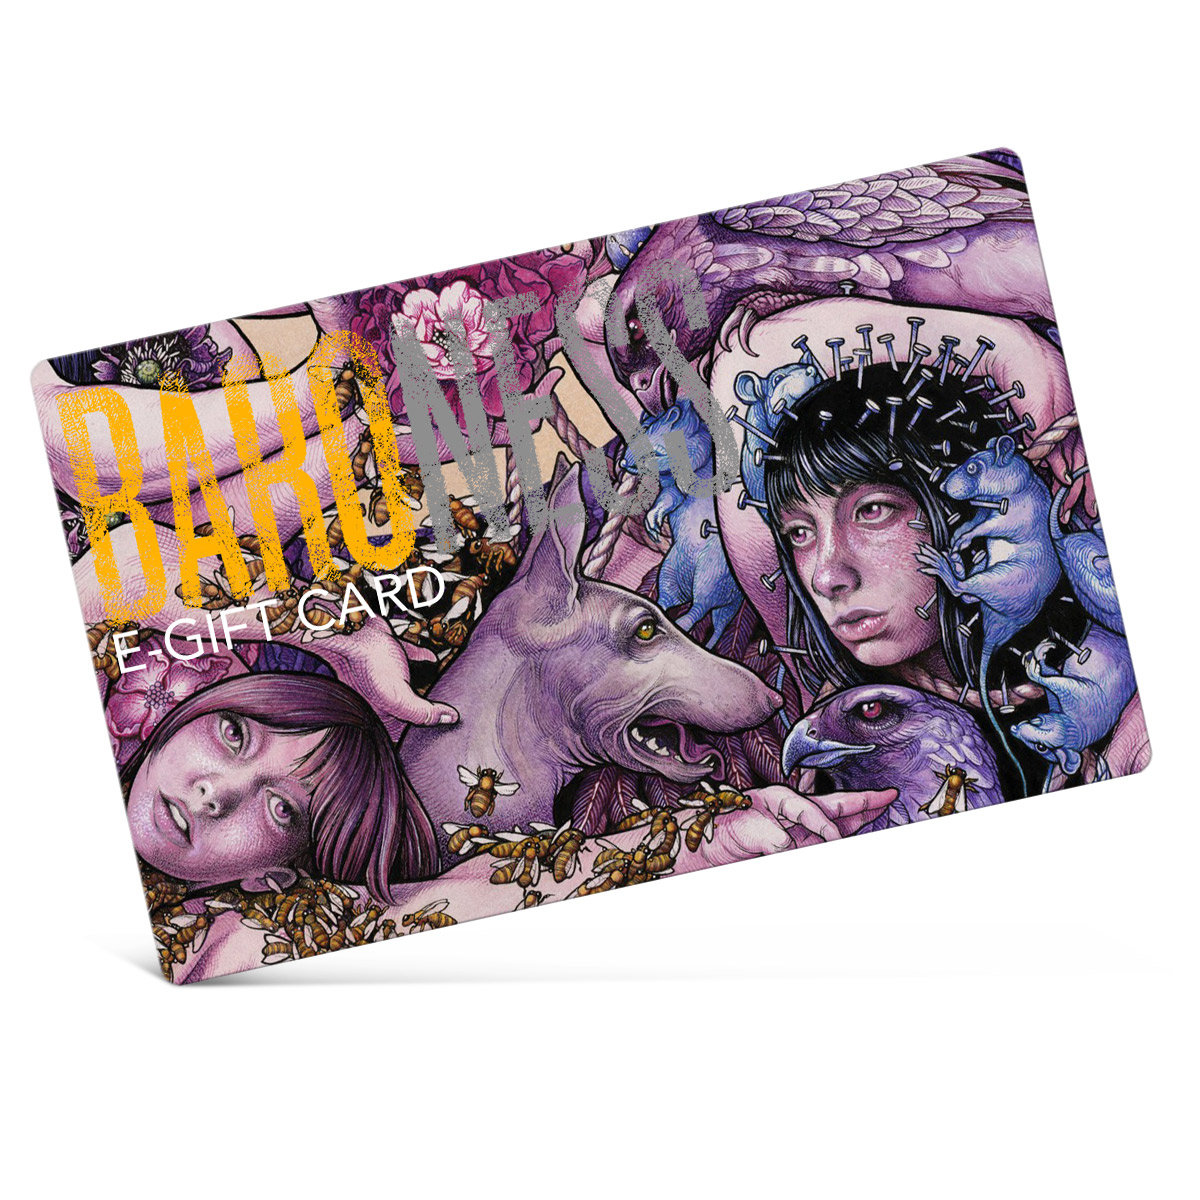 Baroness eGift Card